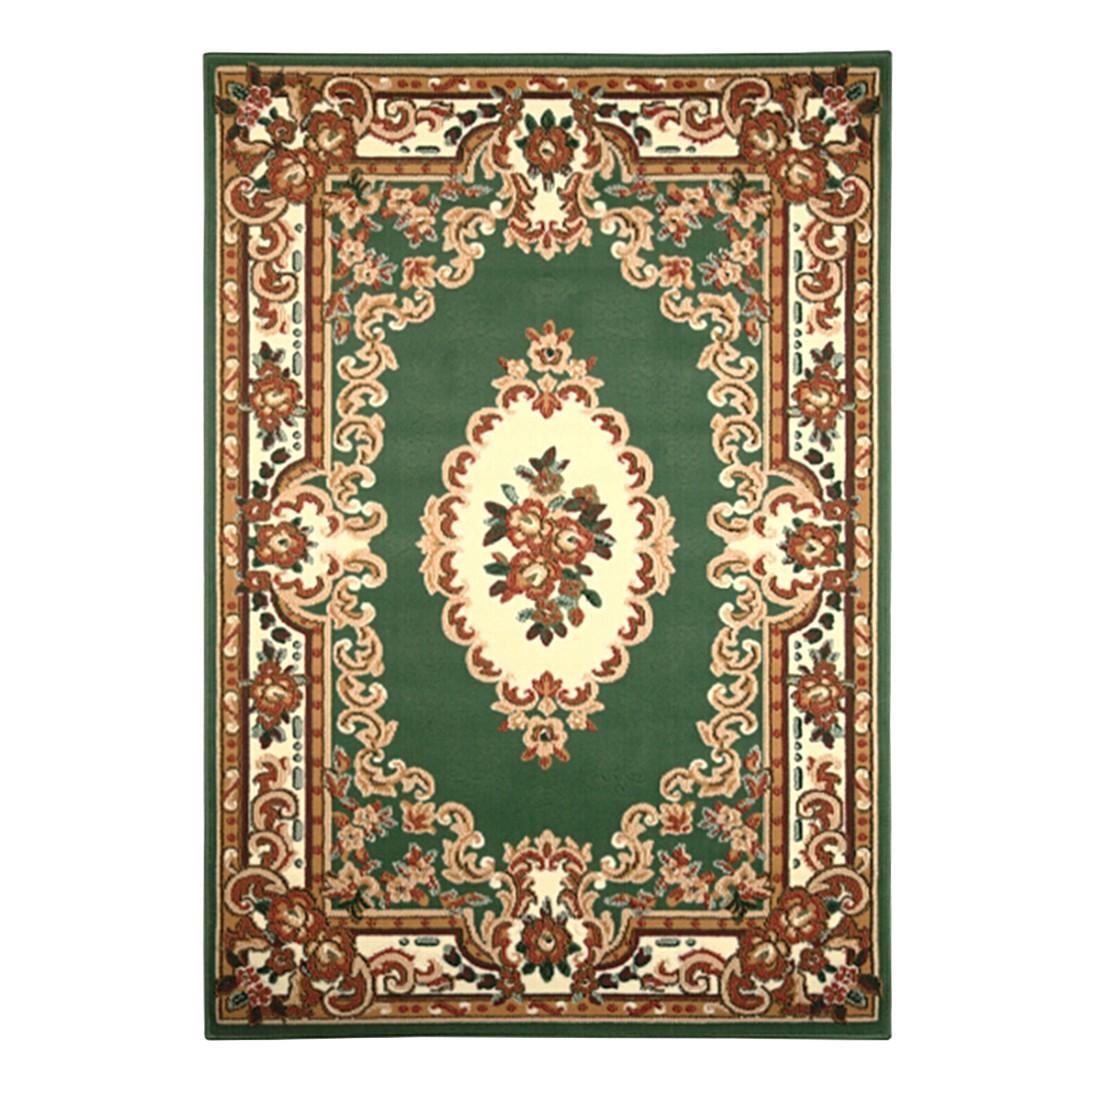 Teppich Peking 710490 – Grün – 170 x 118 cm, KC-Handel online bestellen